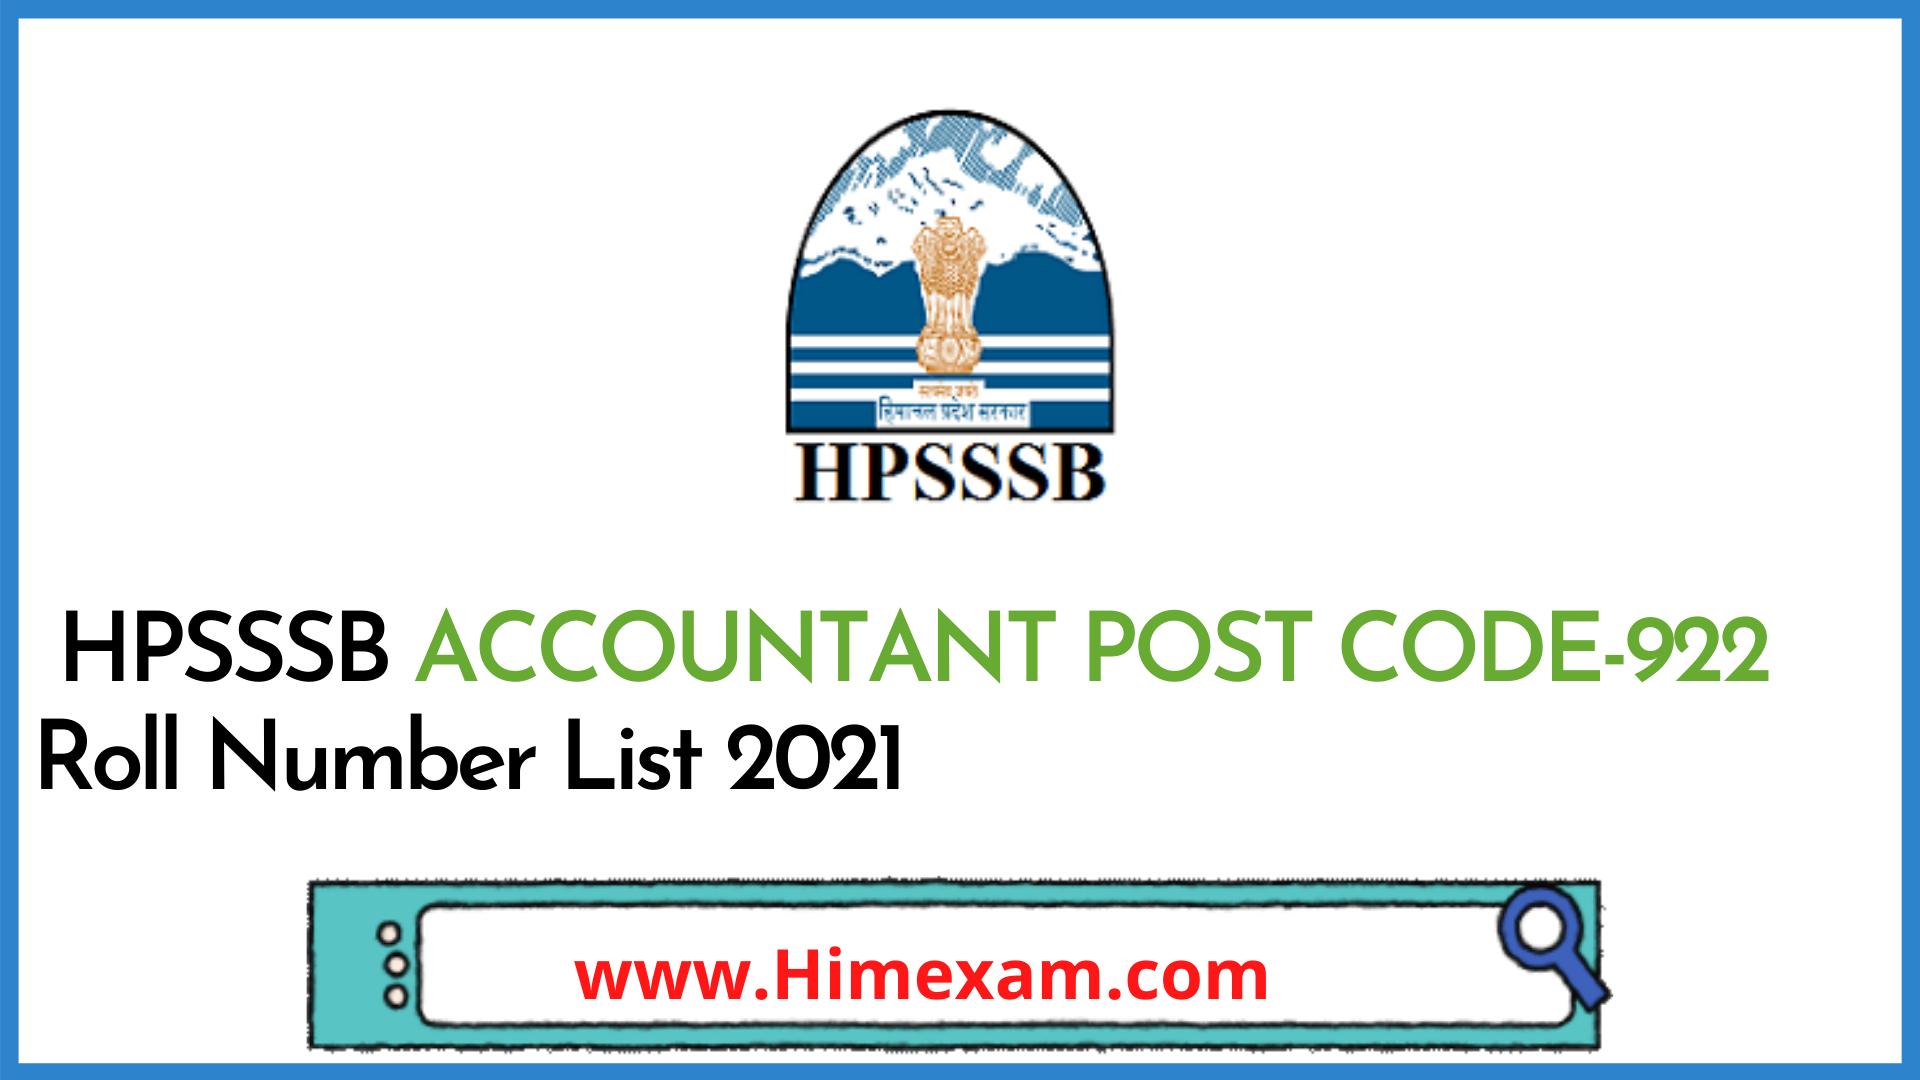 HPSSSB ACCOUNTANT POST CODE-922 Roll Number List 2021